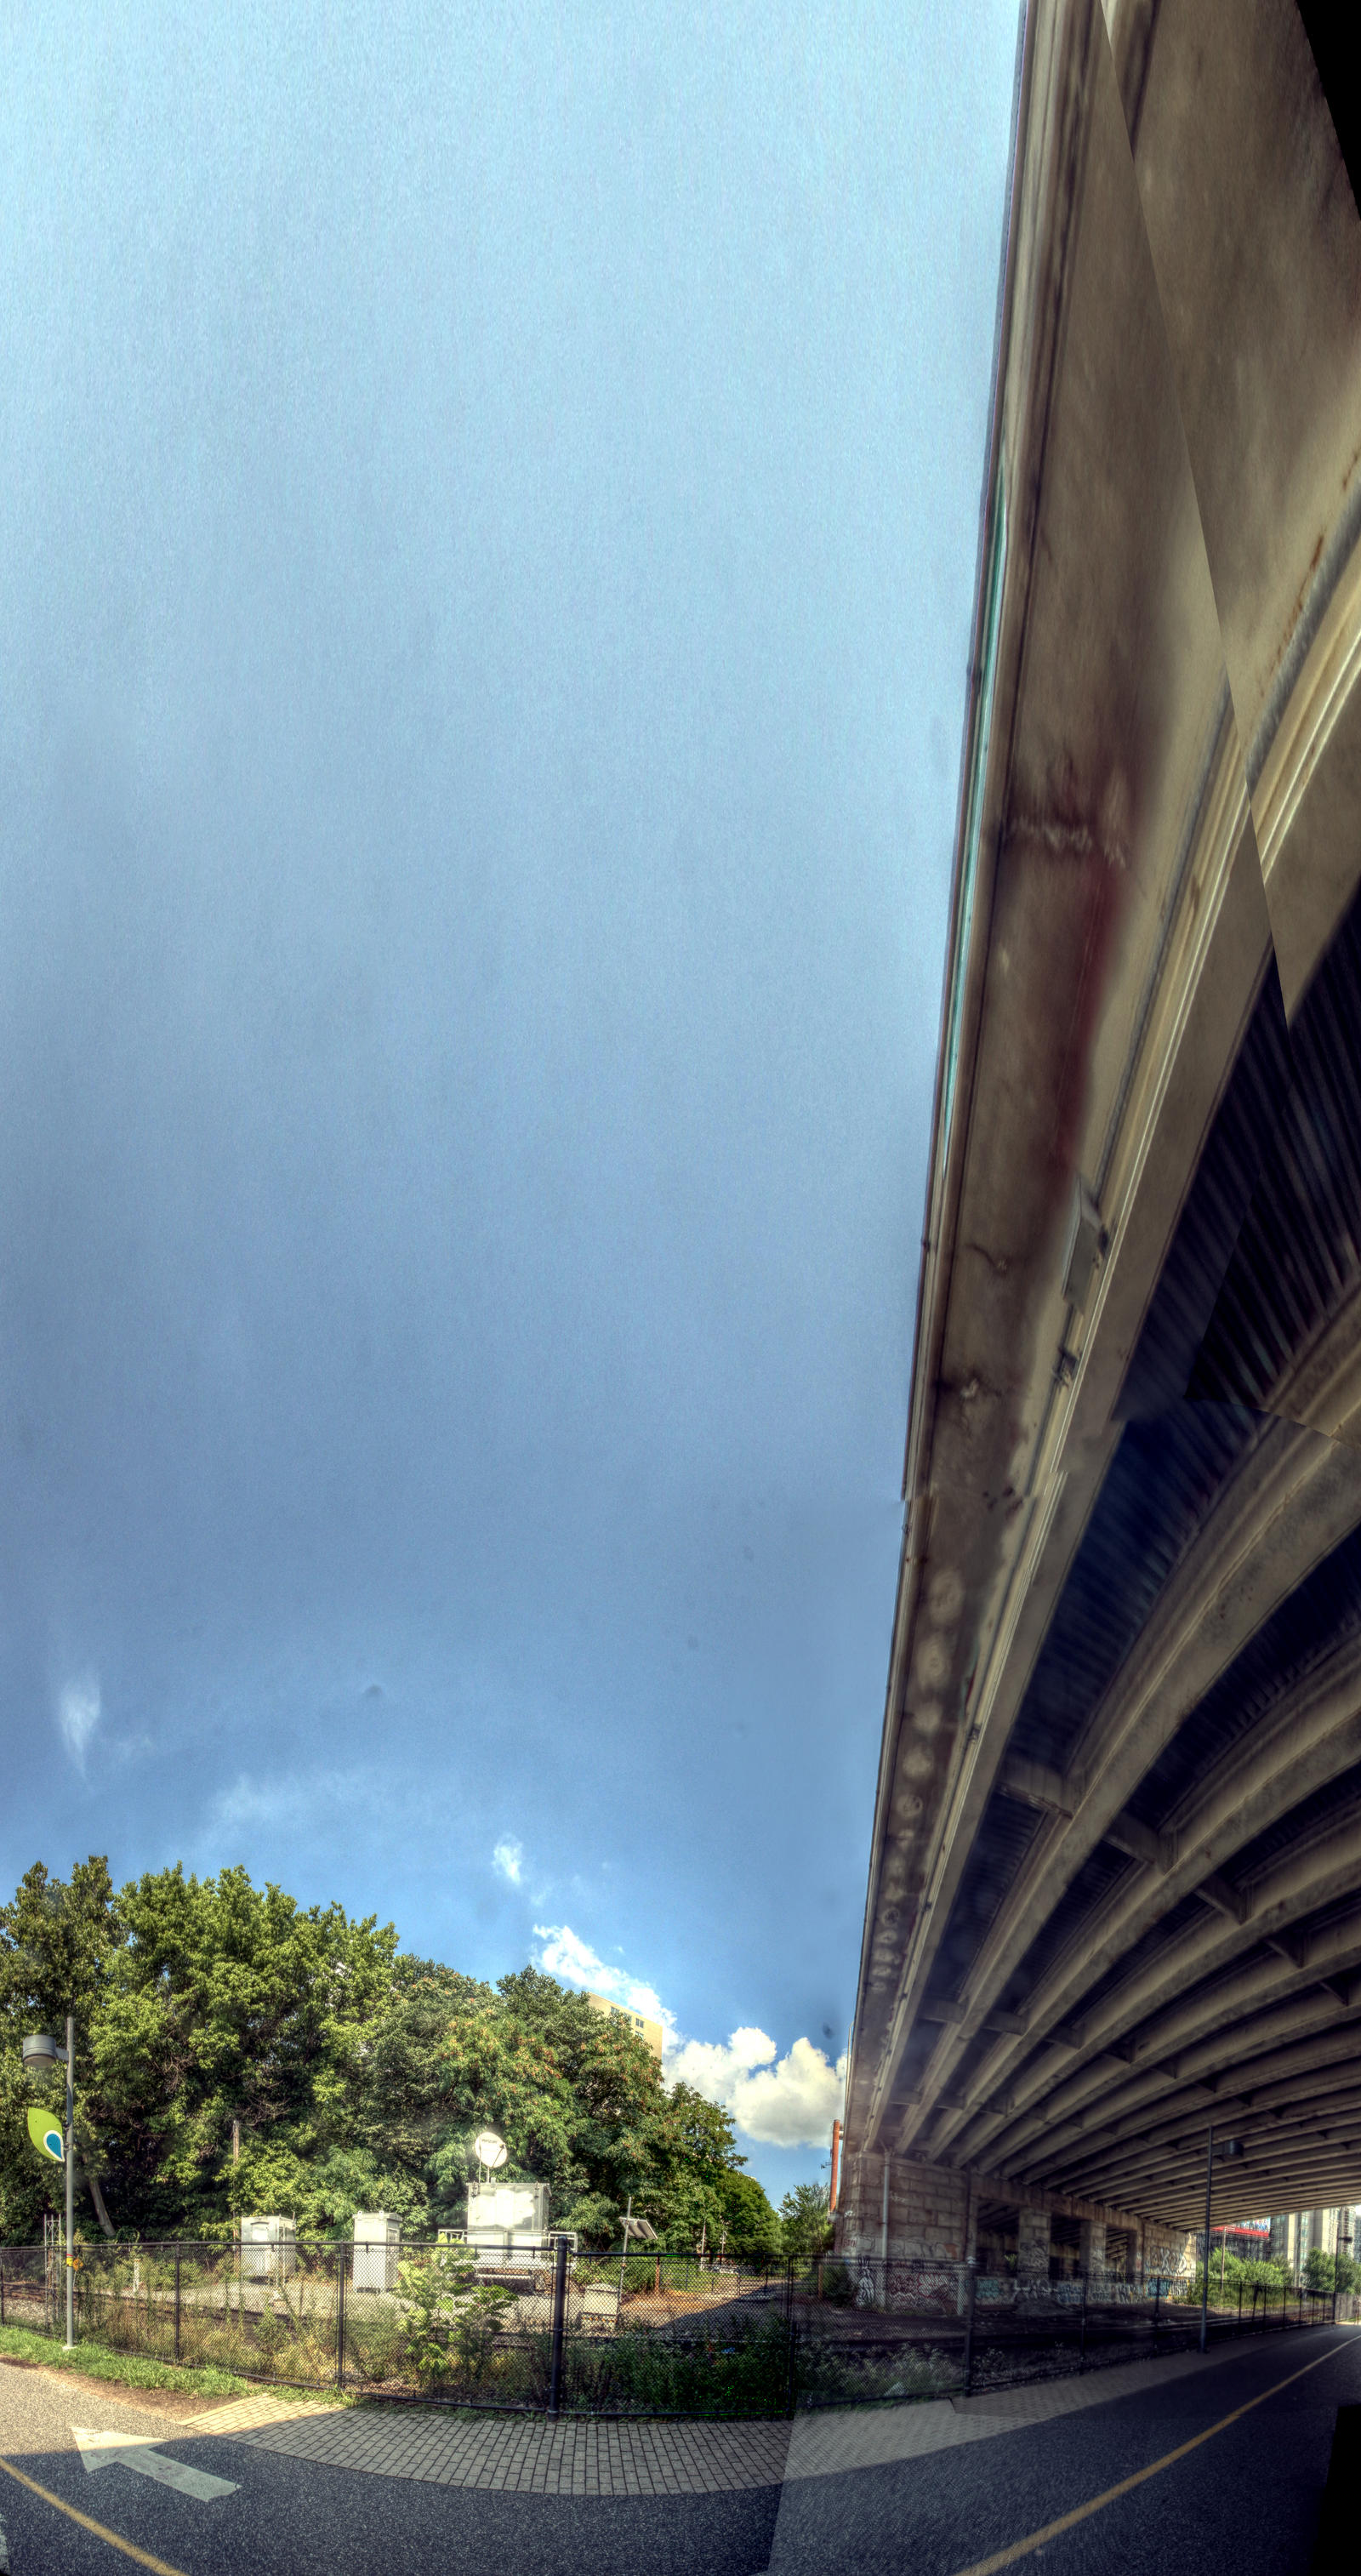 Panorama 3782 hdr pregamma 1 mantiuk06 contrast ma